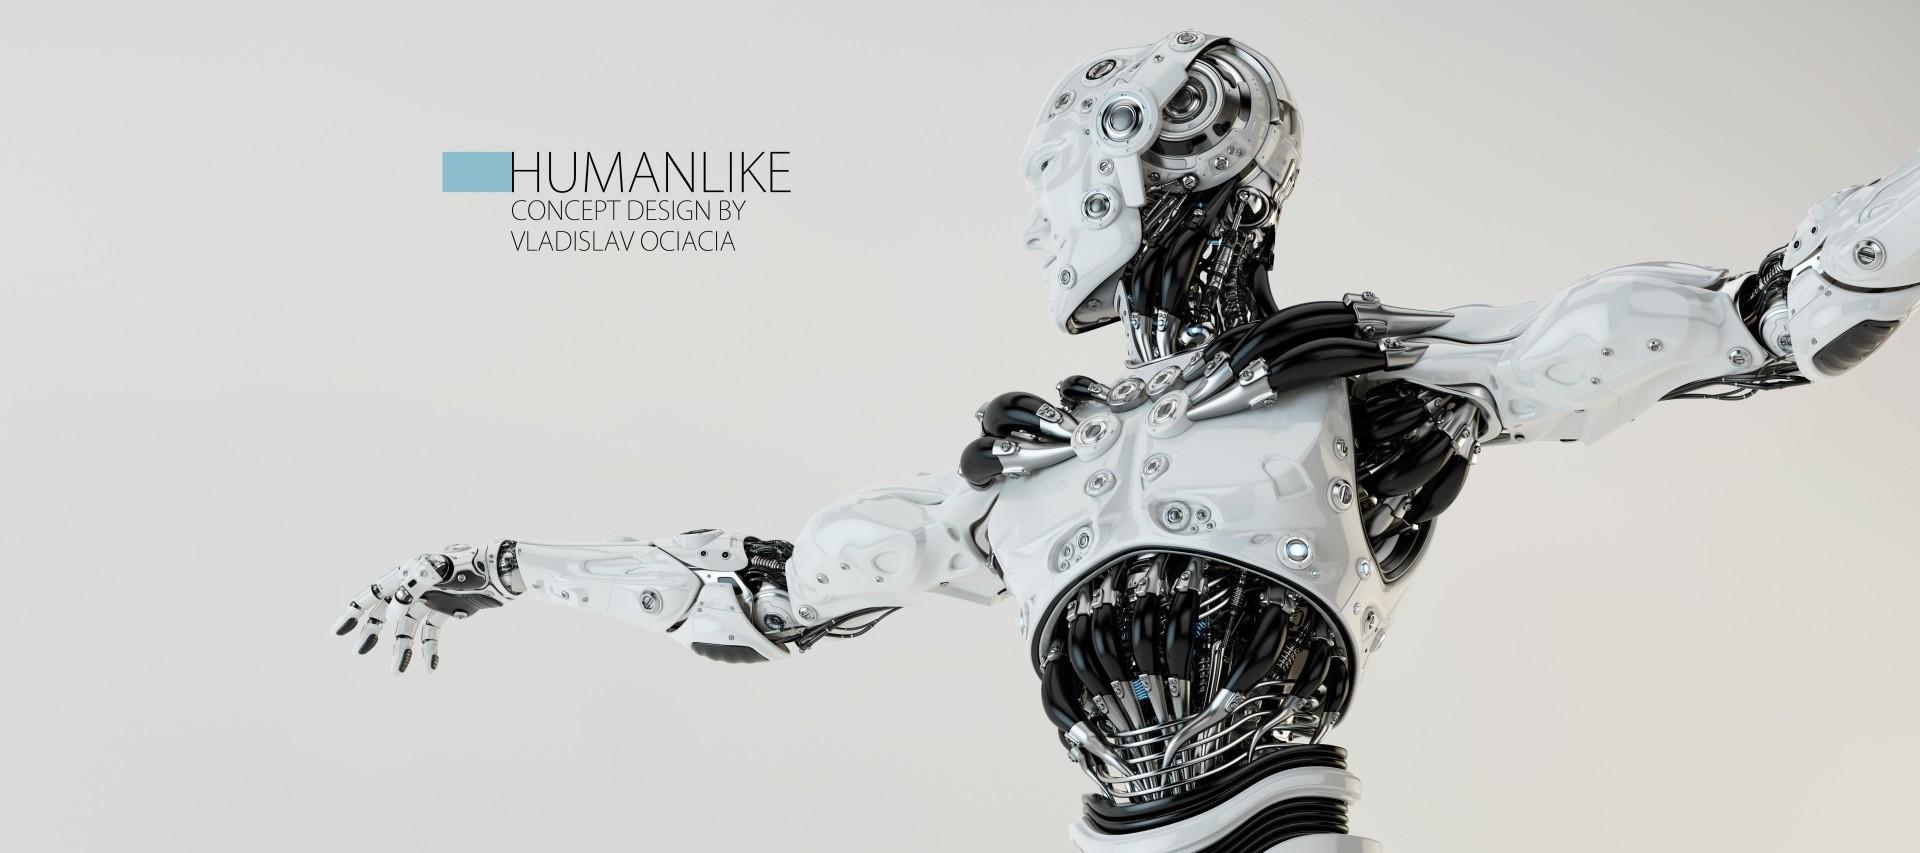 Vladislav ociacia robot humanlike 5